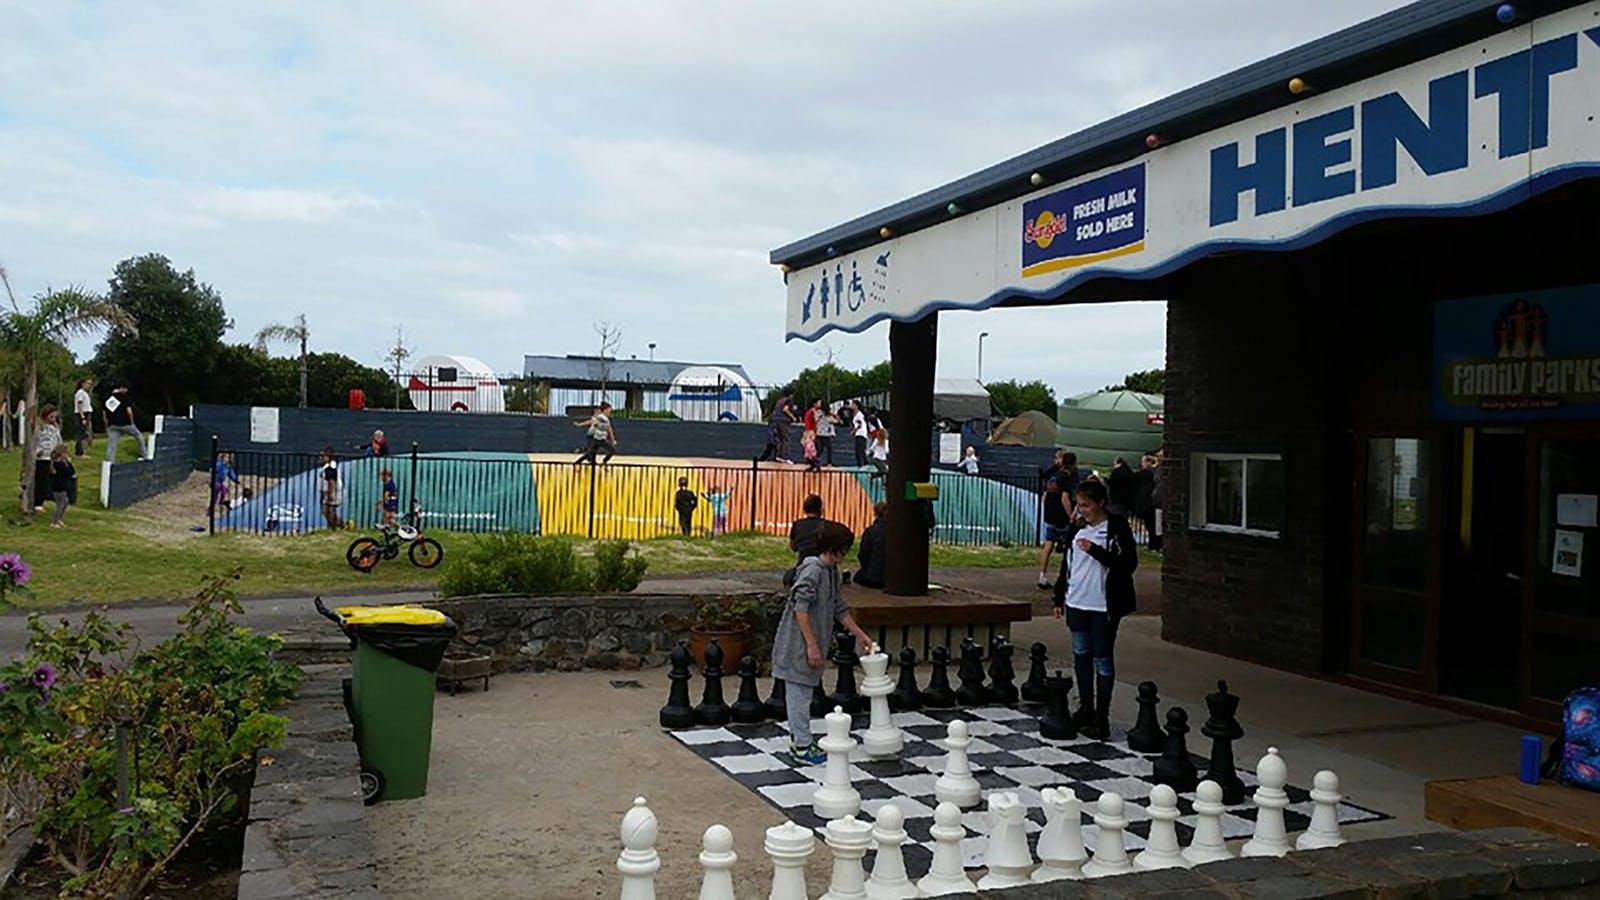 Children's play area at Henty Bay beachfront holiday park